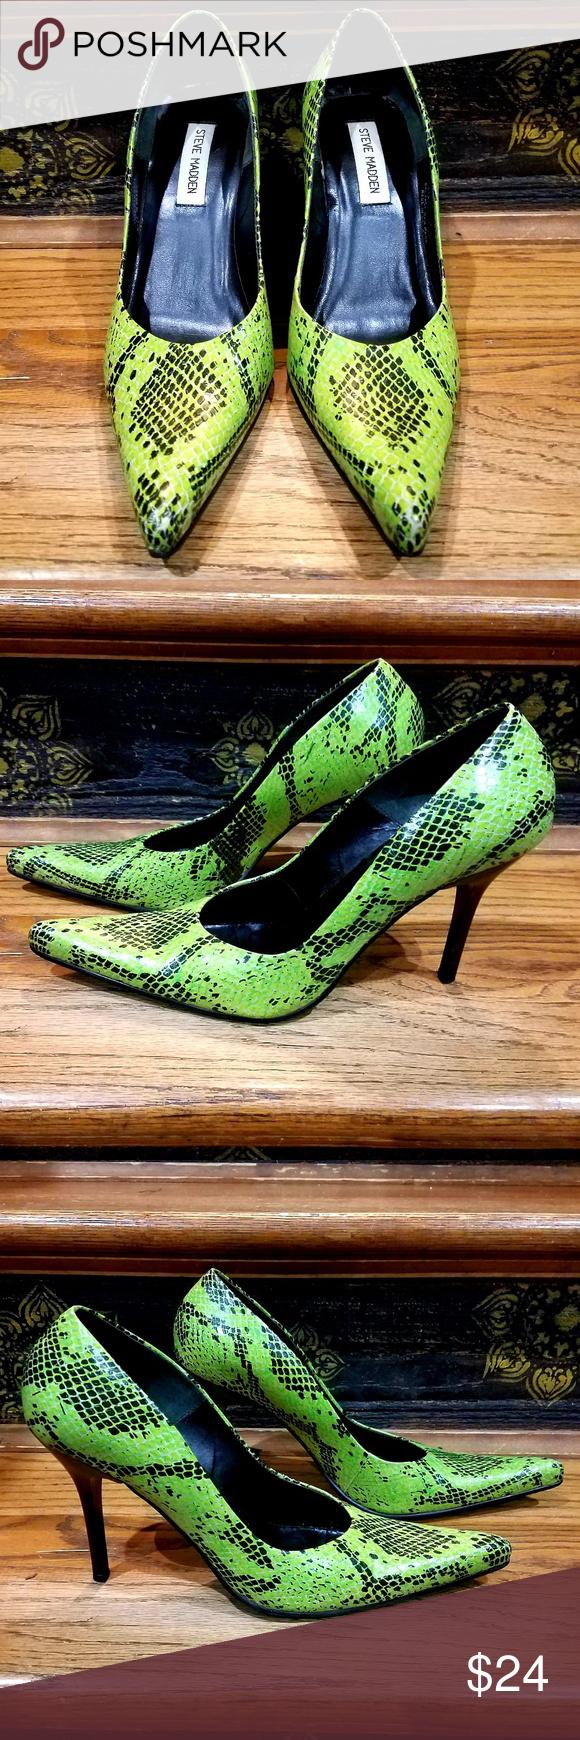 0e7da5a2ab5 Steve Madden Tarrah Snake Print Pointy Heels Let out your wild side ...